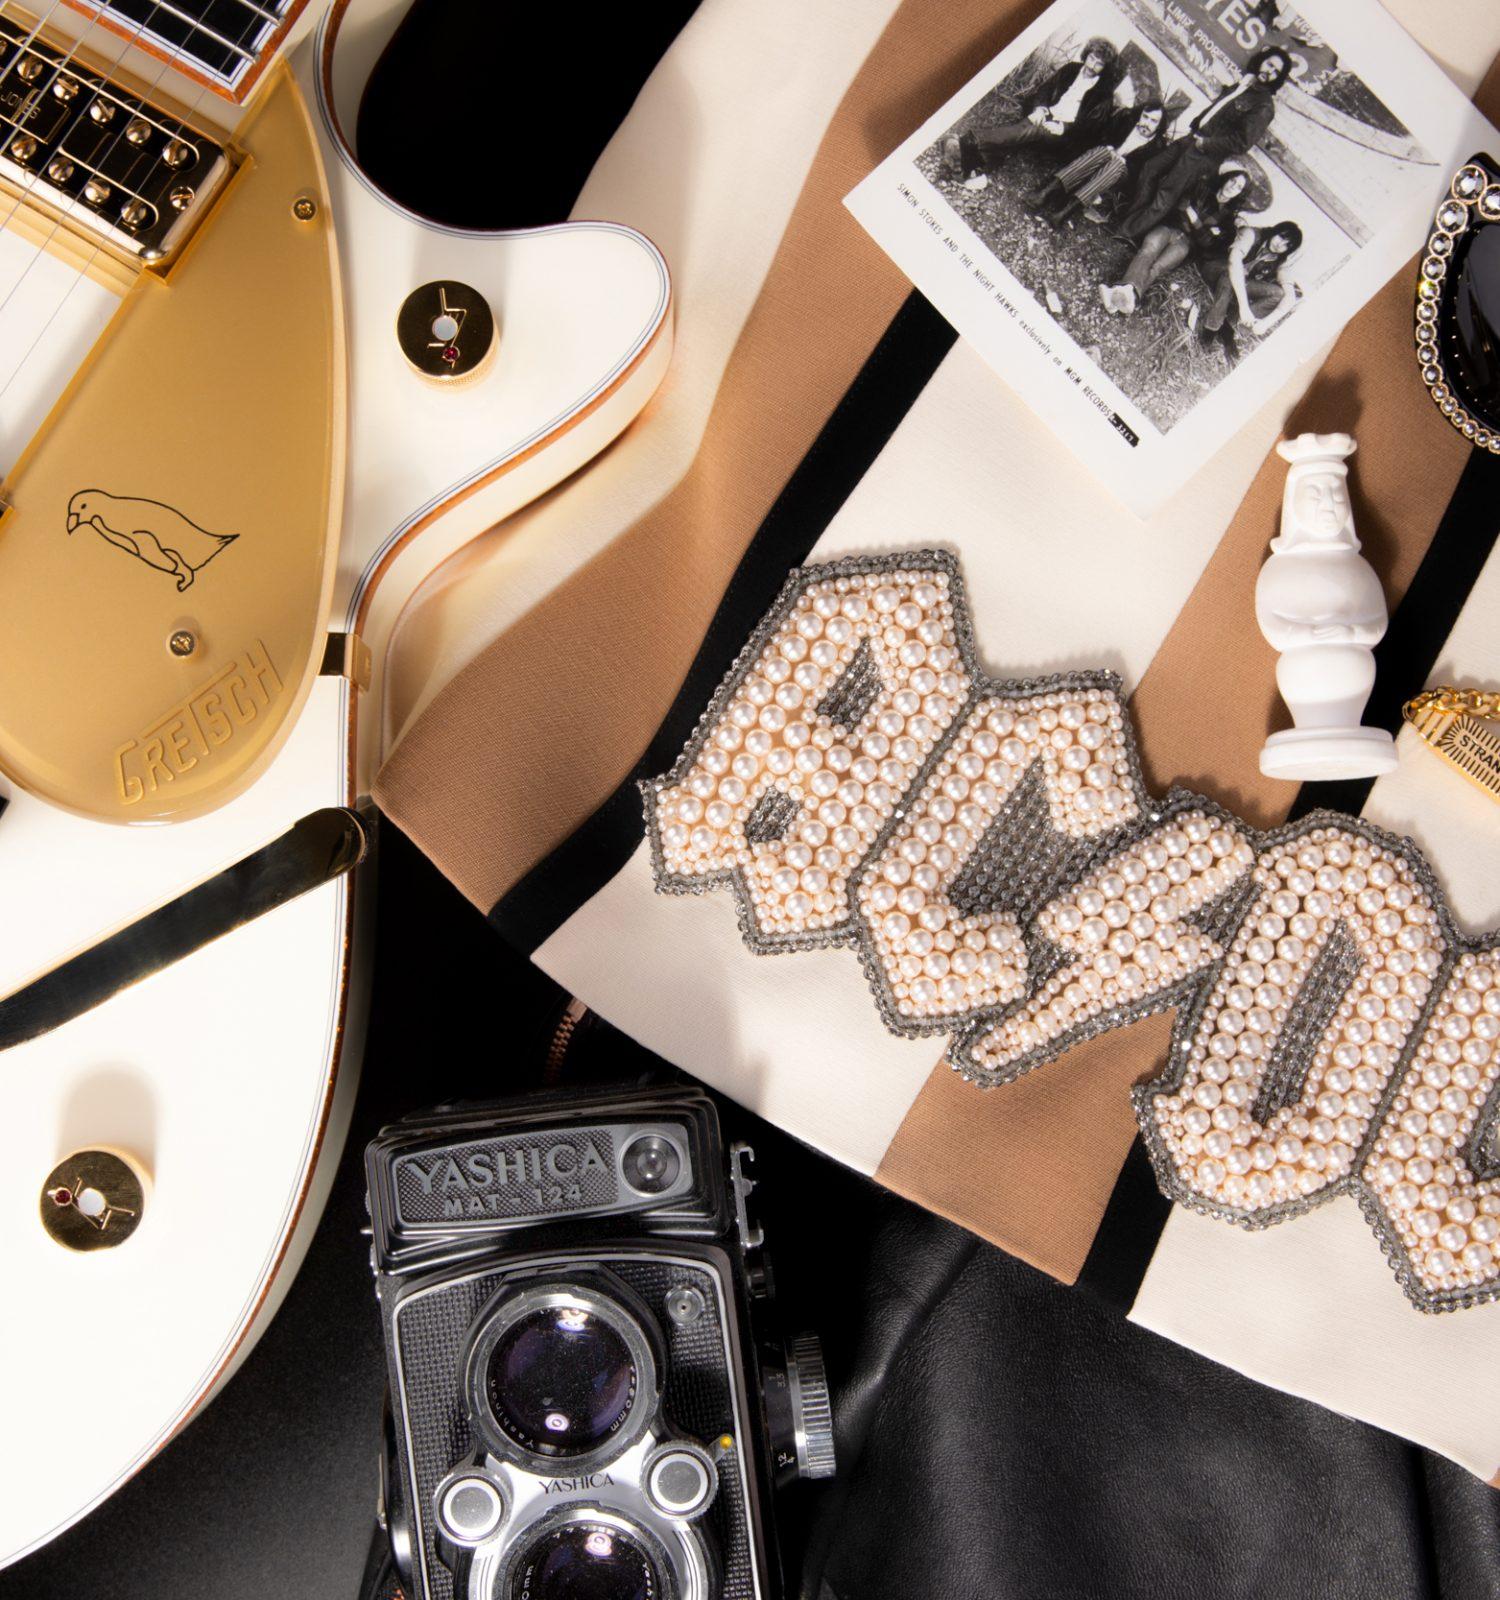 Gold Sheep Design Gretsch Penguin Personal Style Branding For Musicians